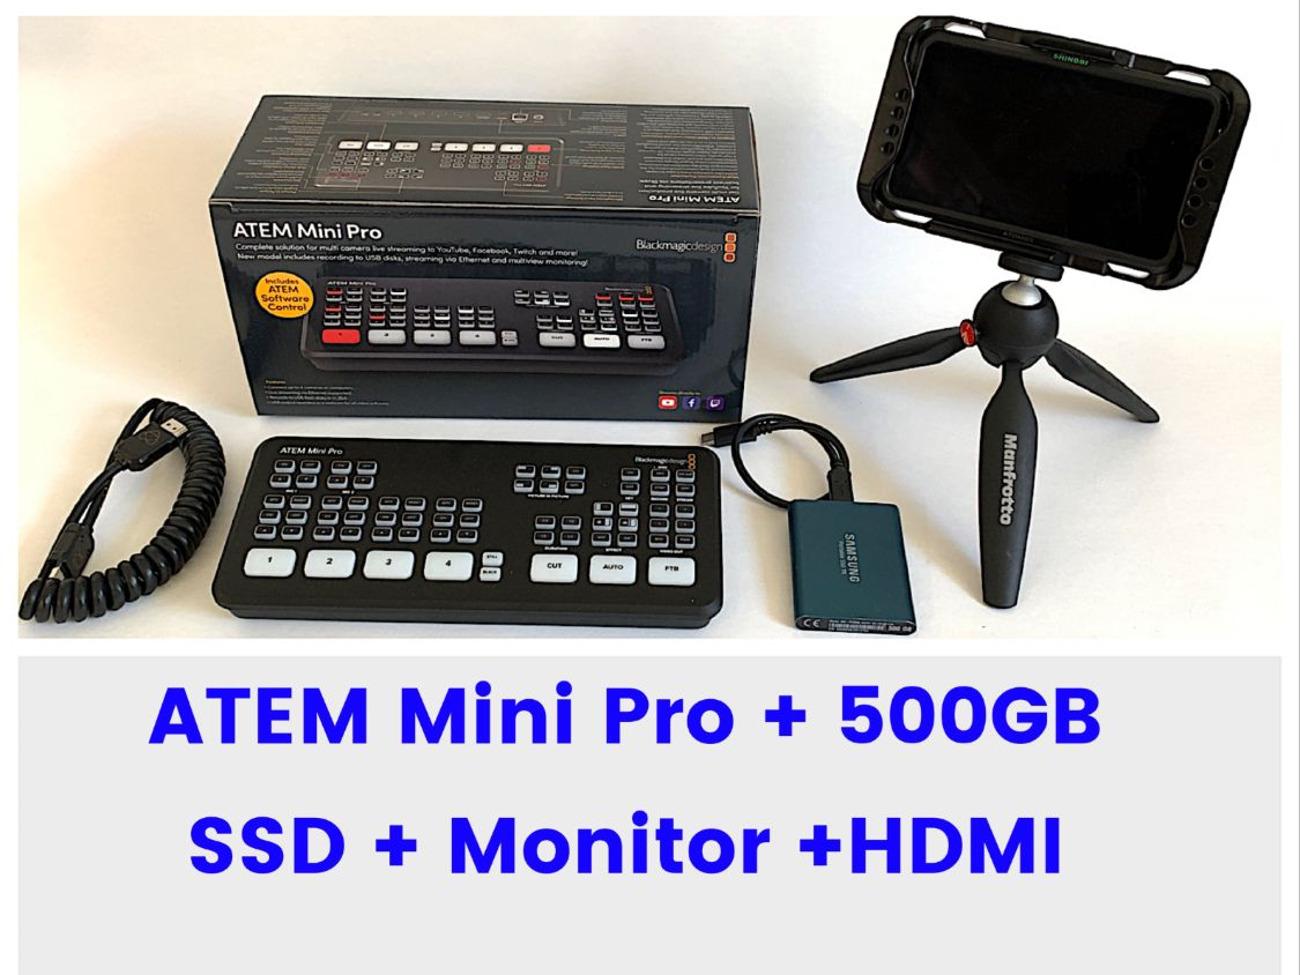 Rent Blackmagic Design Atem Mini Pro 500gb Ssd Monitor In London Rent For 43 00 Day 37 14 Week